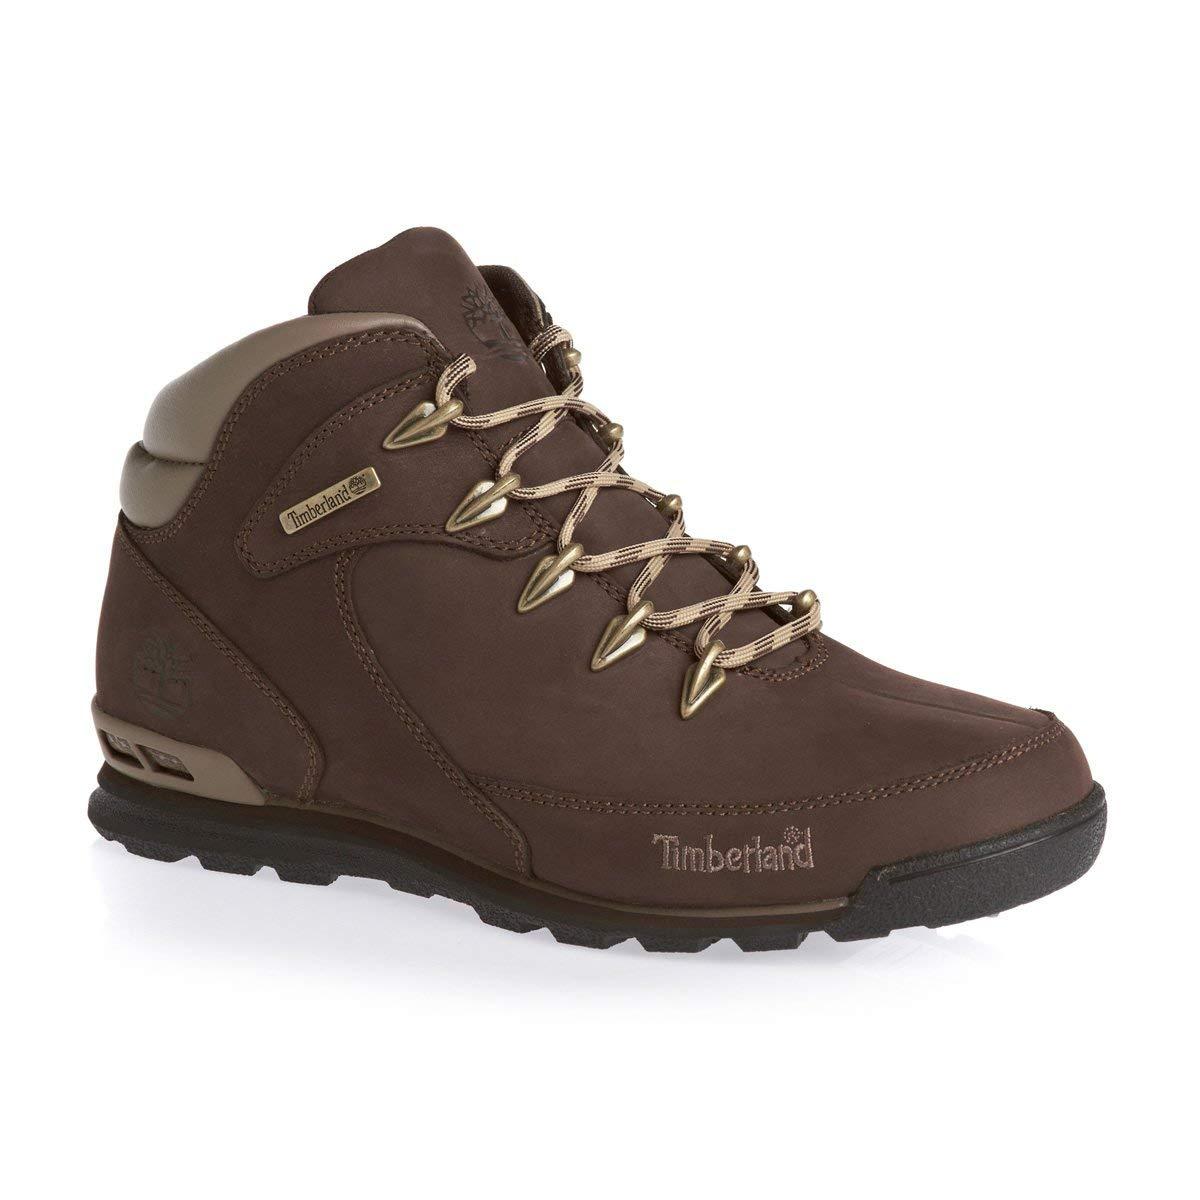 796182549cc Amazon.com | Timberland Ek Newmarket Euro Rock Hiker Boots 8.5 D(M ...